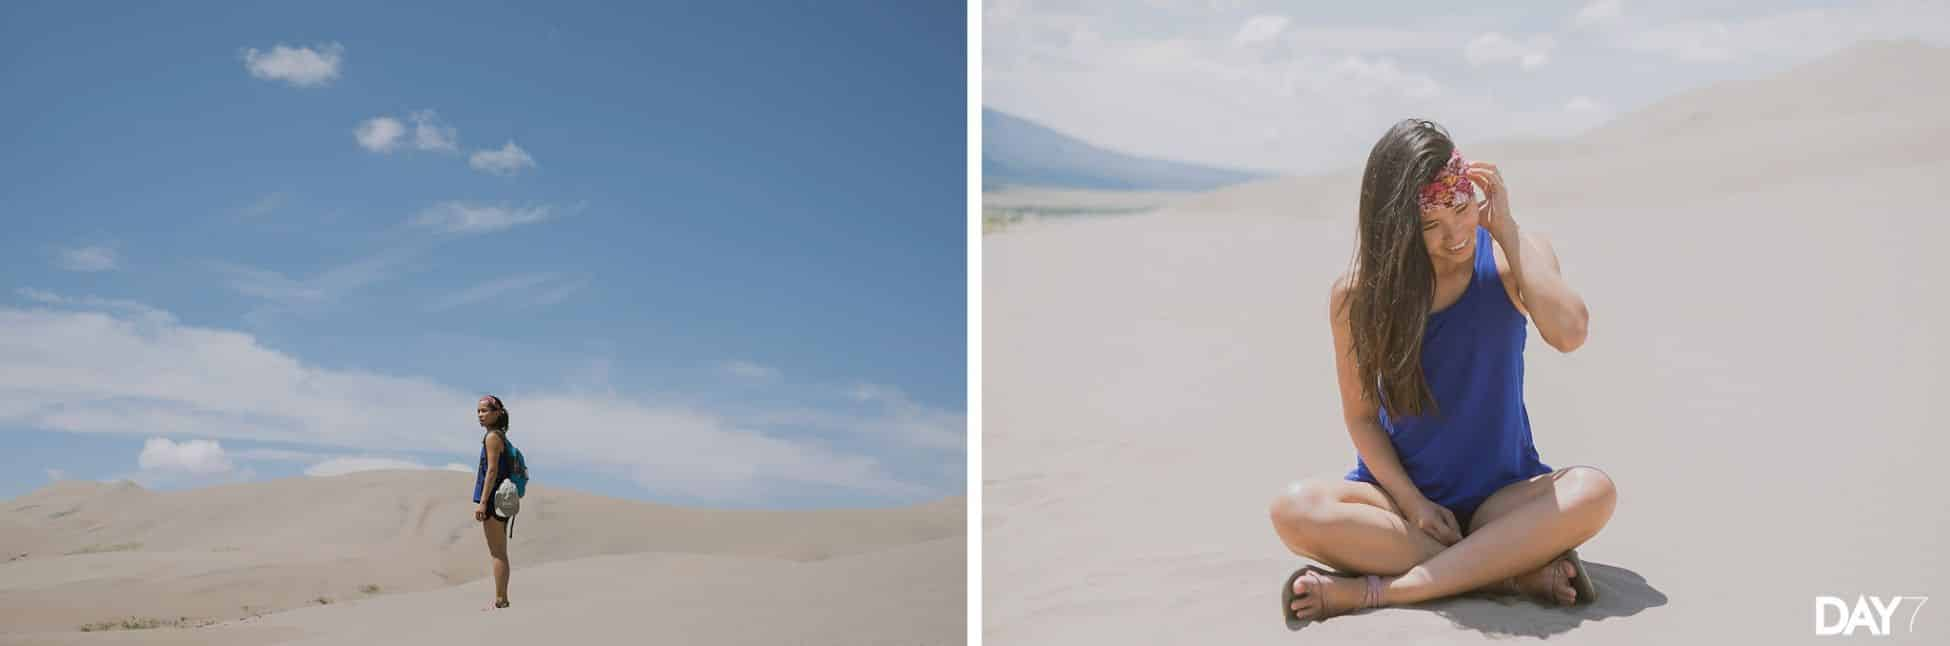 Rocky Mountain National Park Portraits